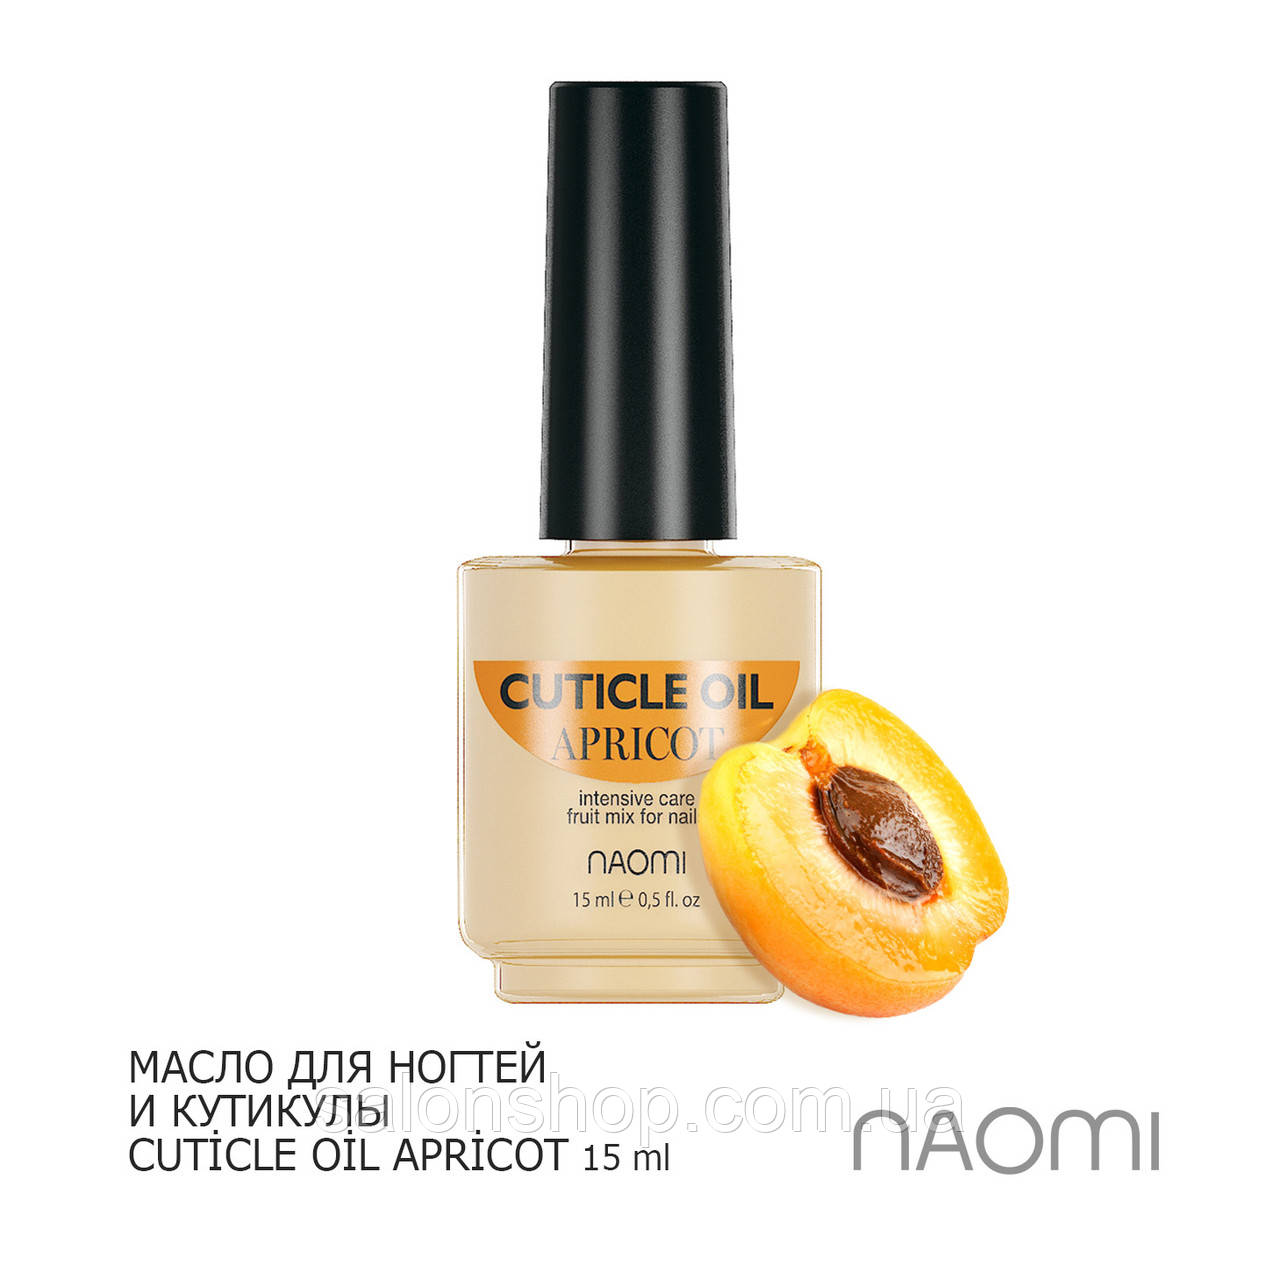 Naomi Cuticle Oil Apricot Масло для ногтей и кутикулы Абрикос, 15 мл